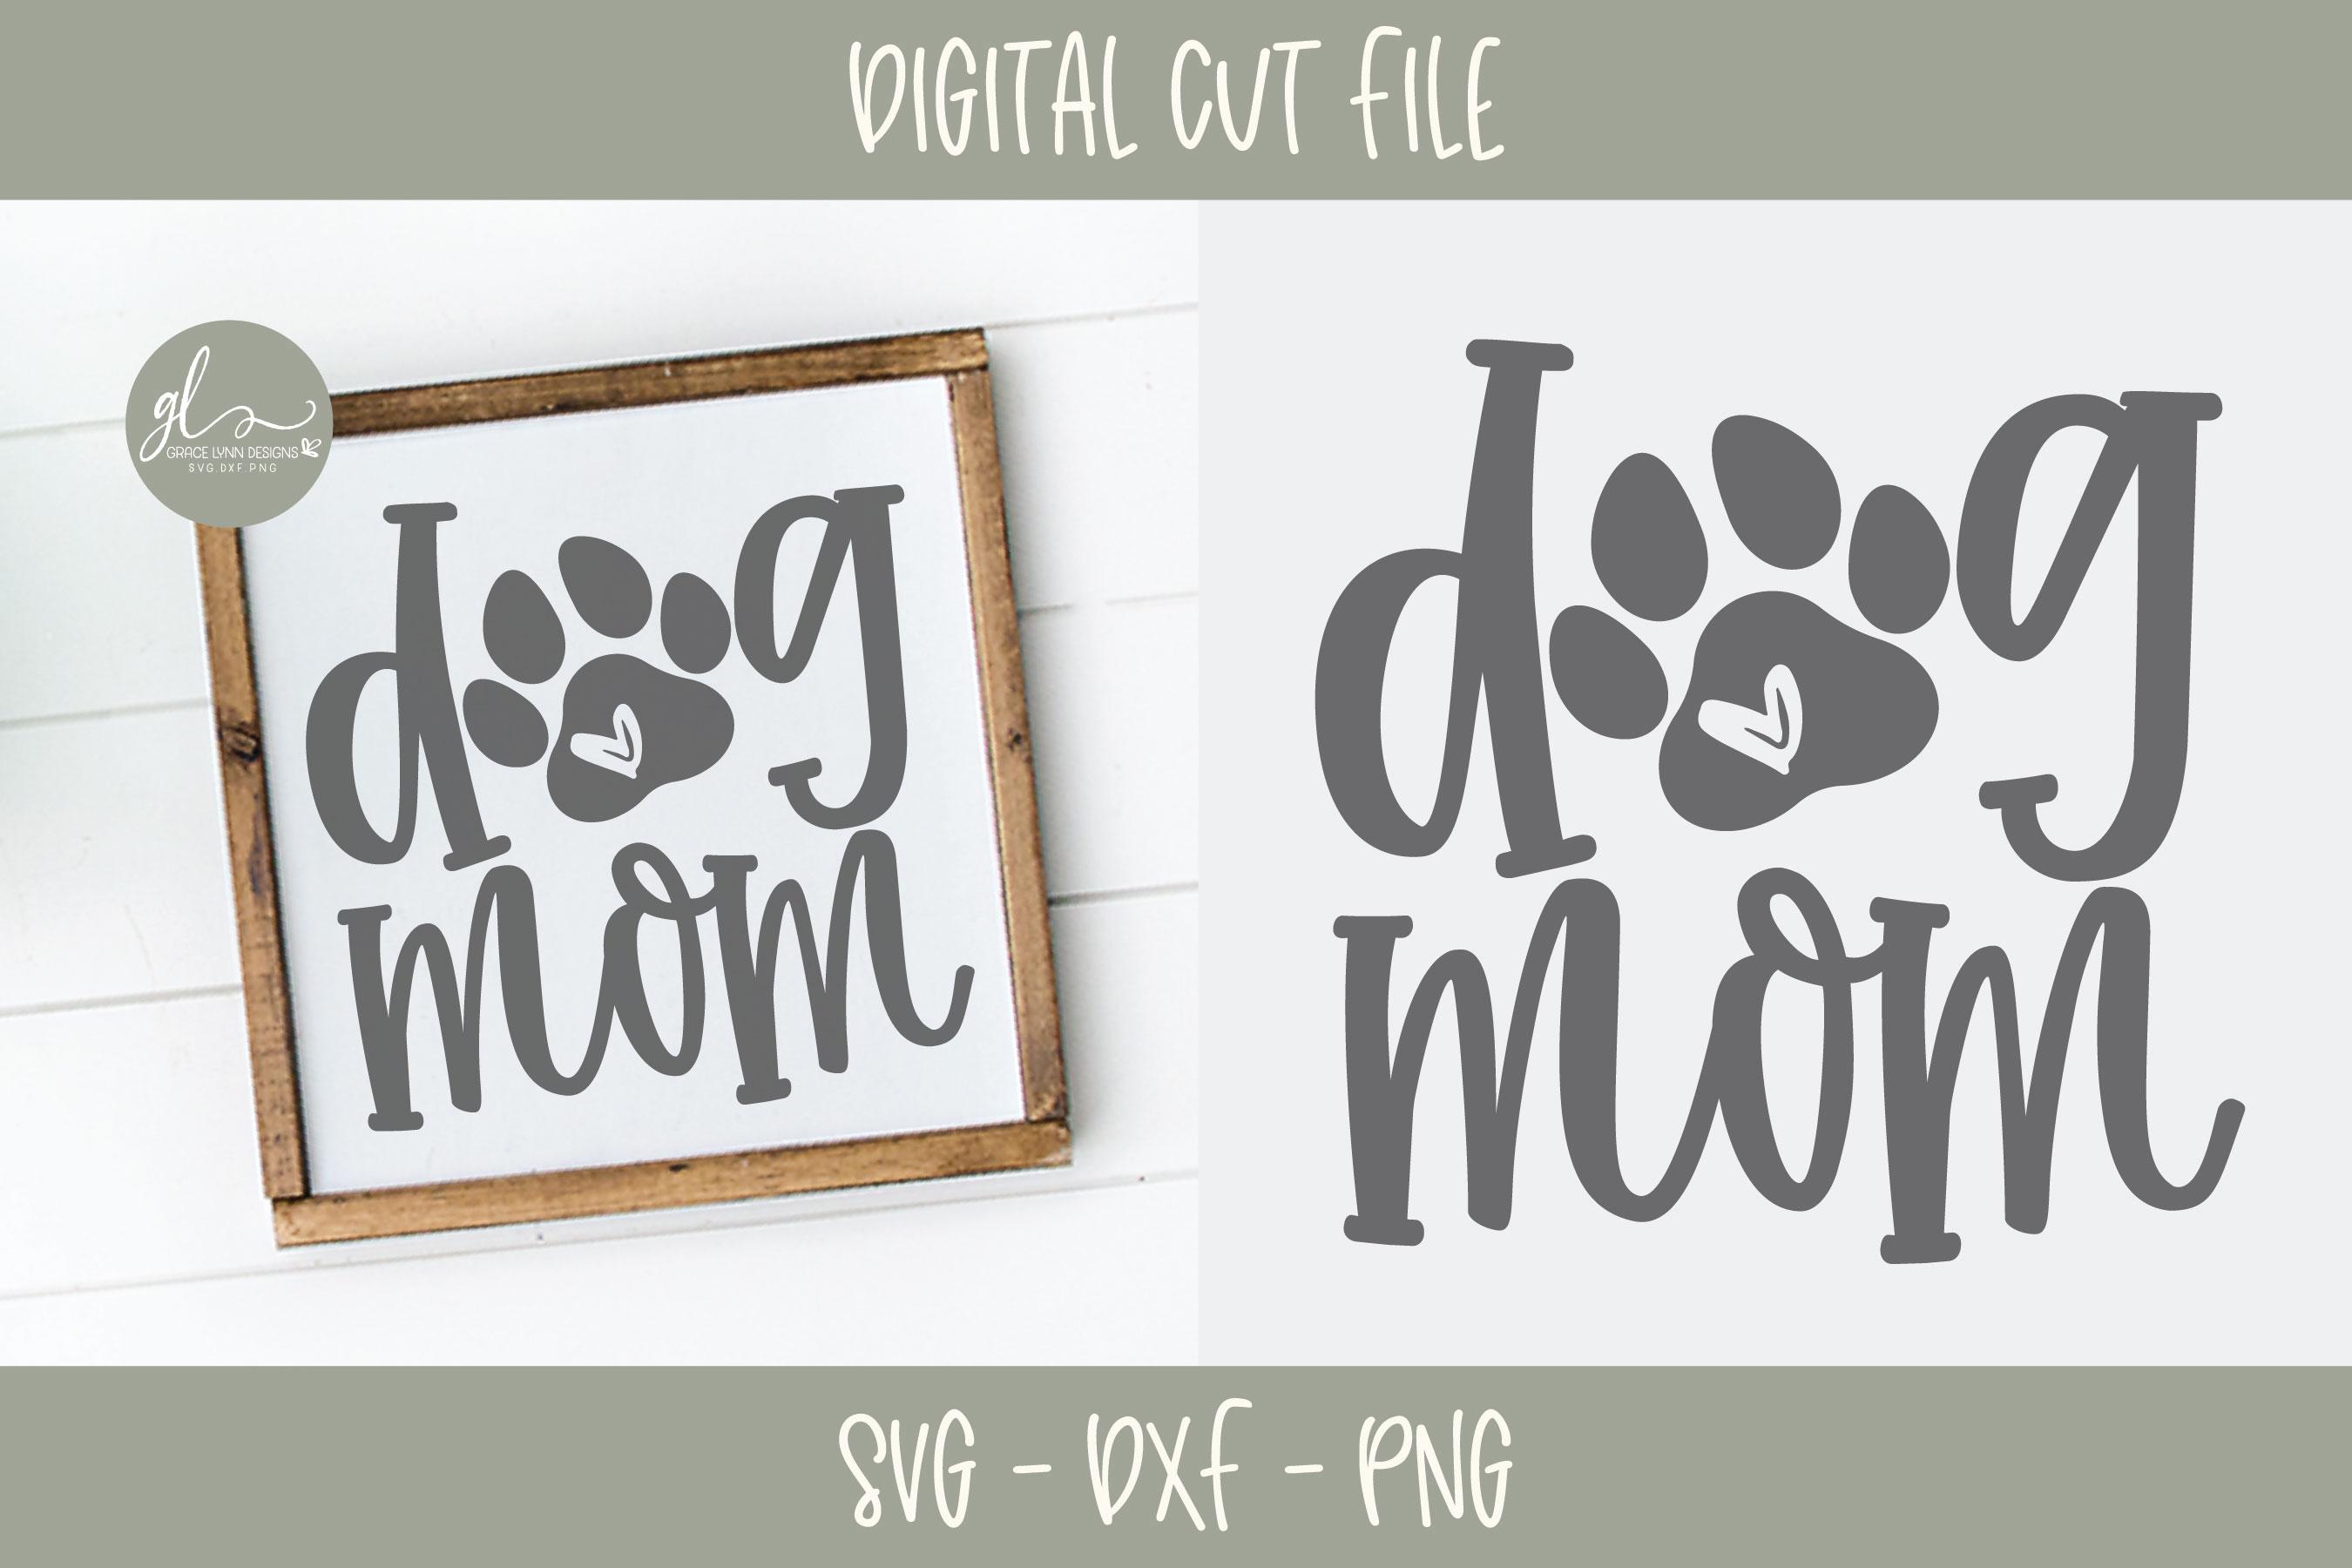 Dog Quotes Bundle Vol. 2 - 10 Designs - SVG Cut Files example image 2